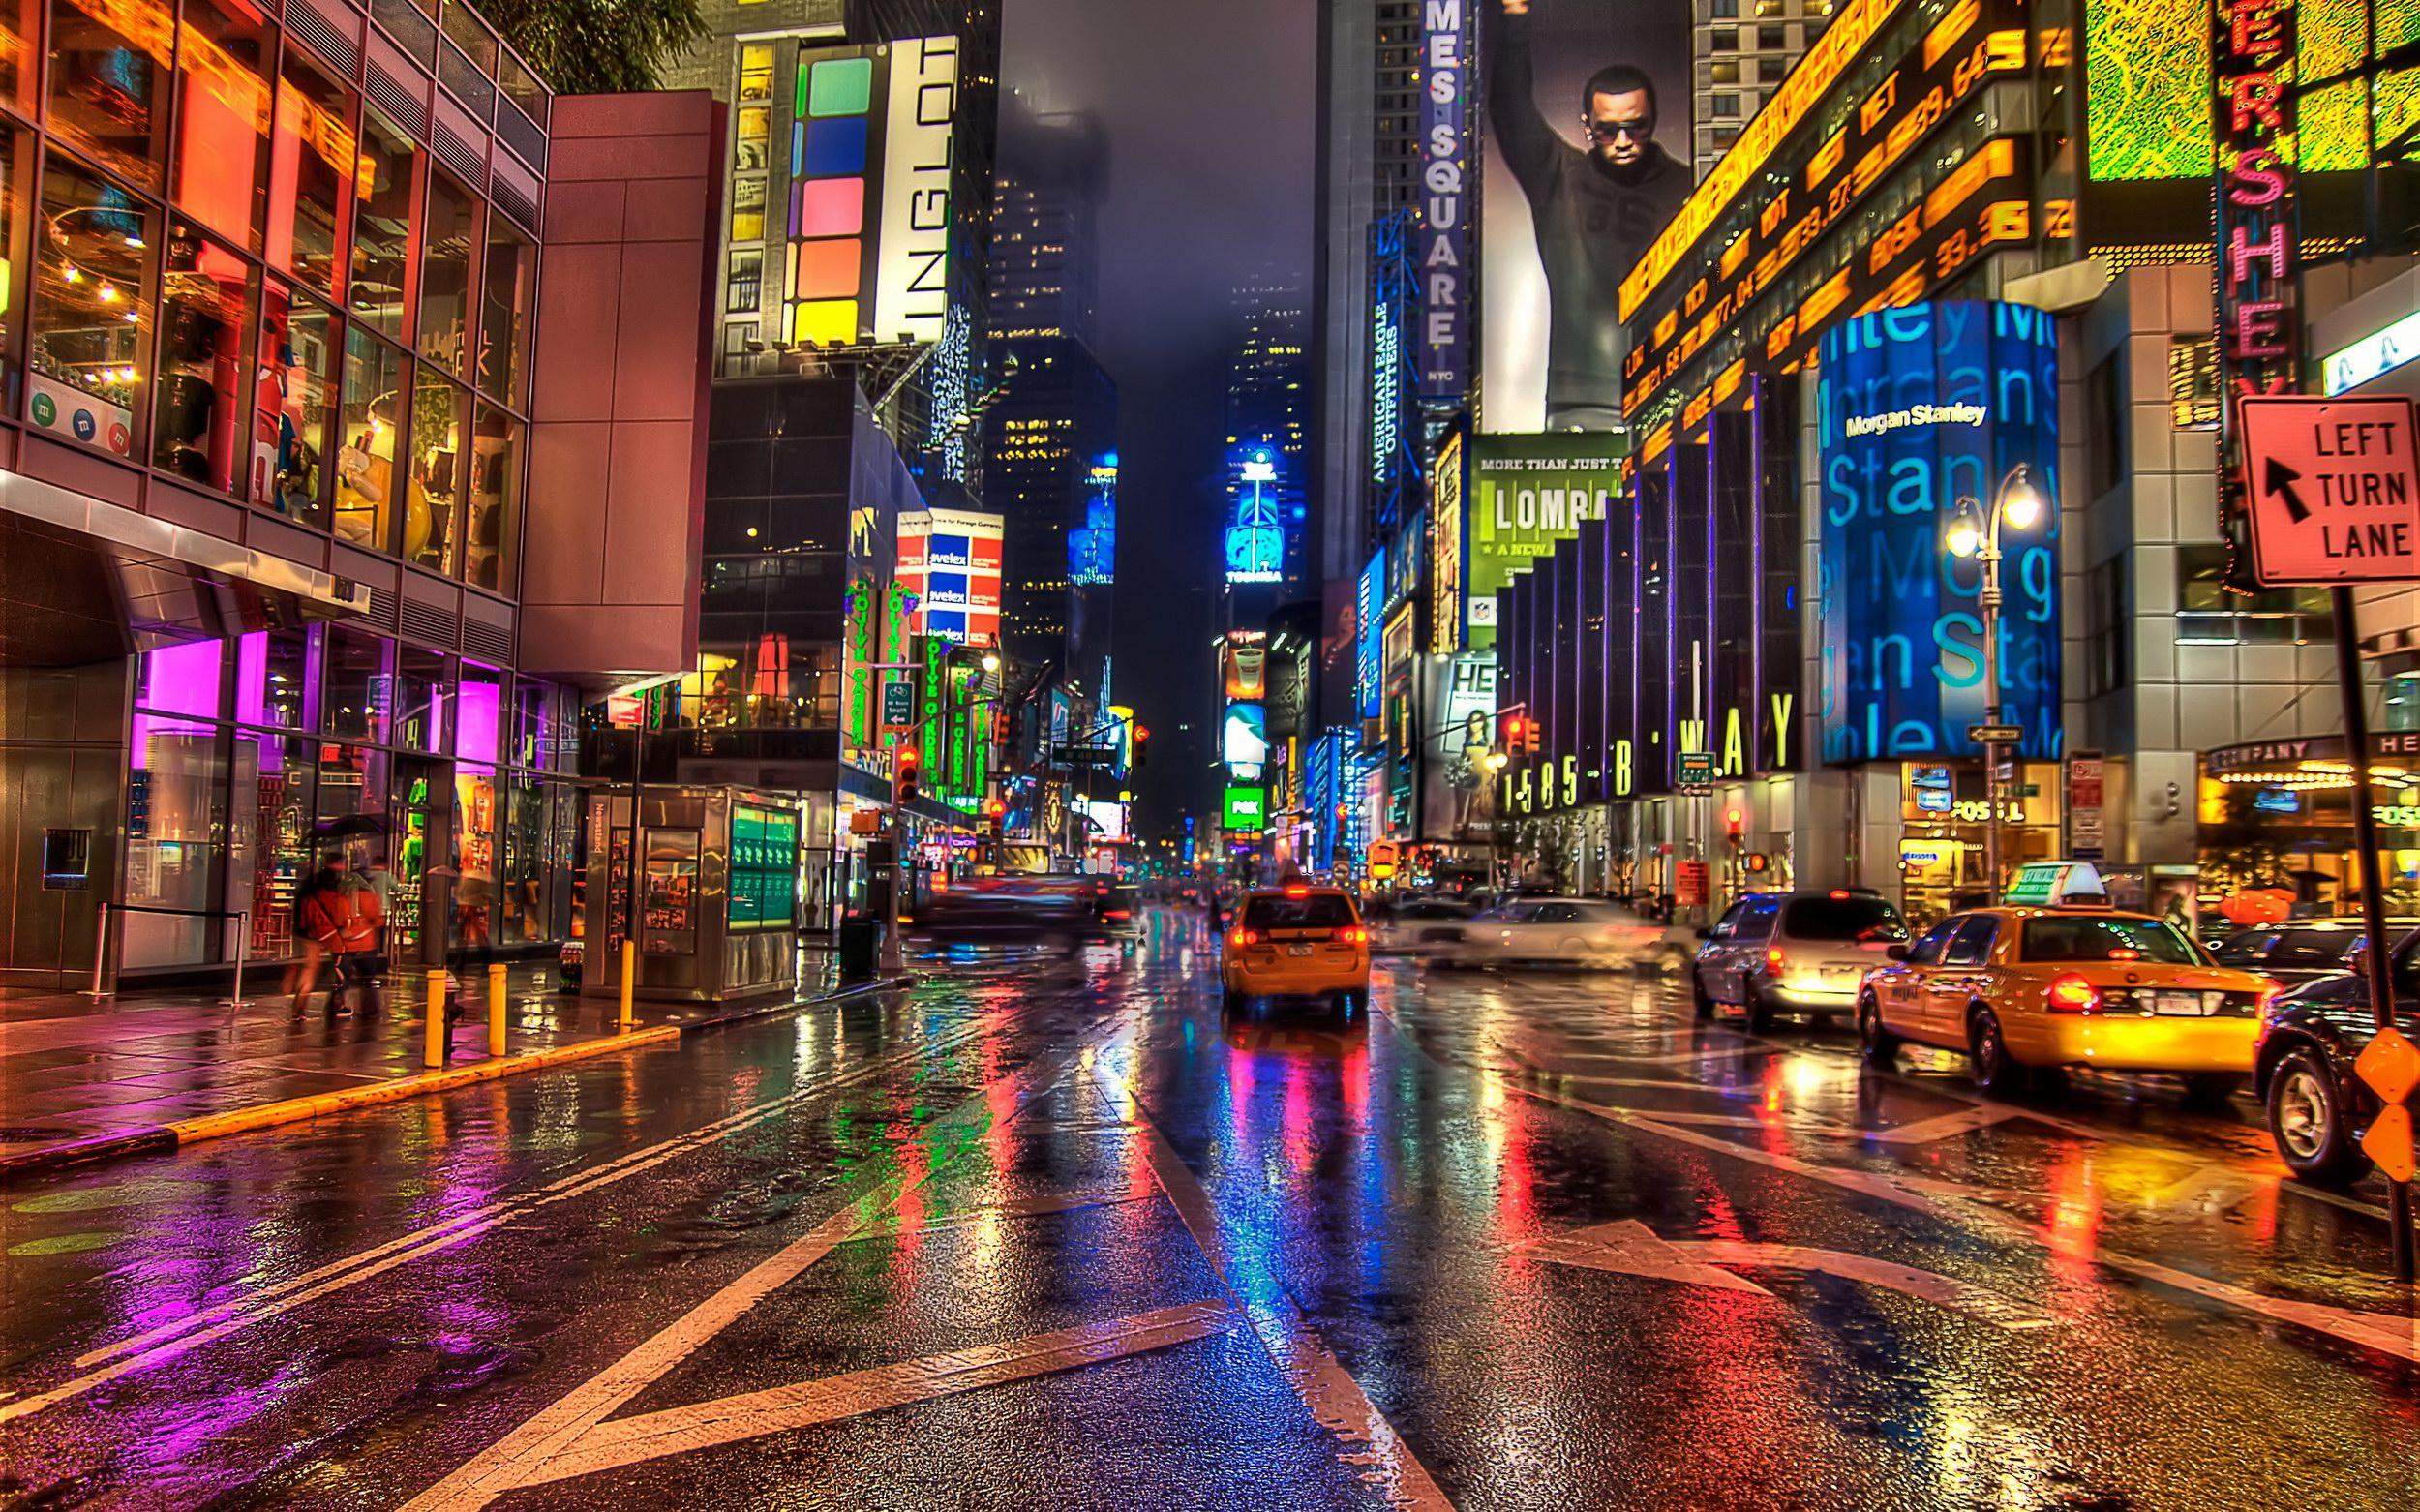 New York City Times Square Wallpaper hd wallpaper background desktop 2500x1562